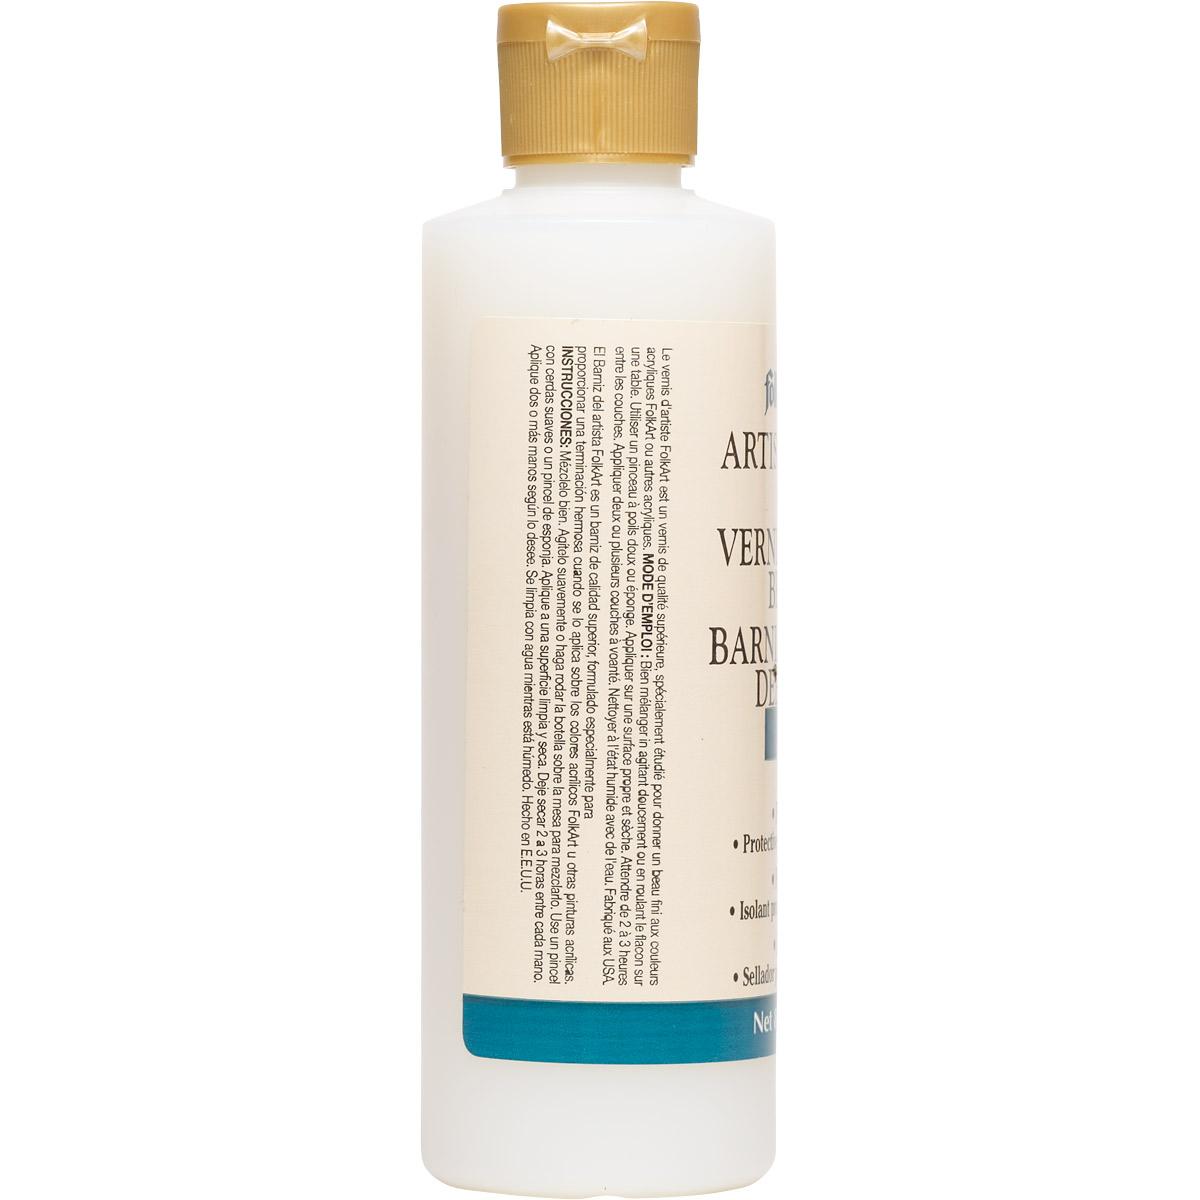 FolkArt ® Finishes - Artists Varnish - Gloss, 8 oz. - 884